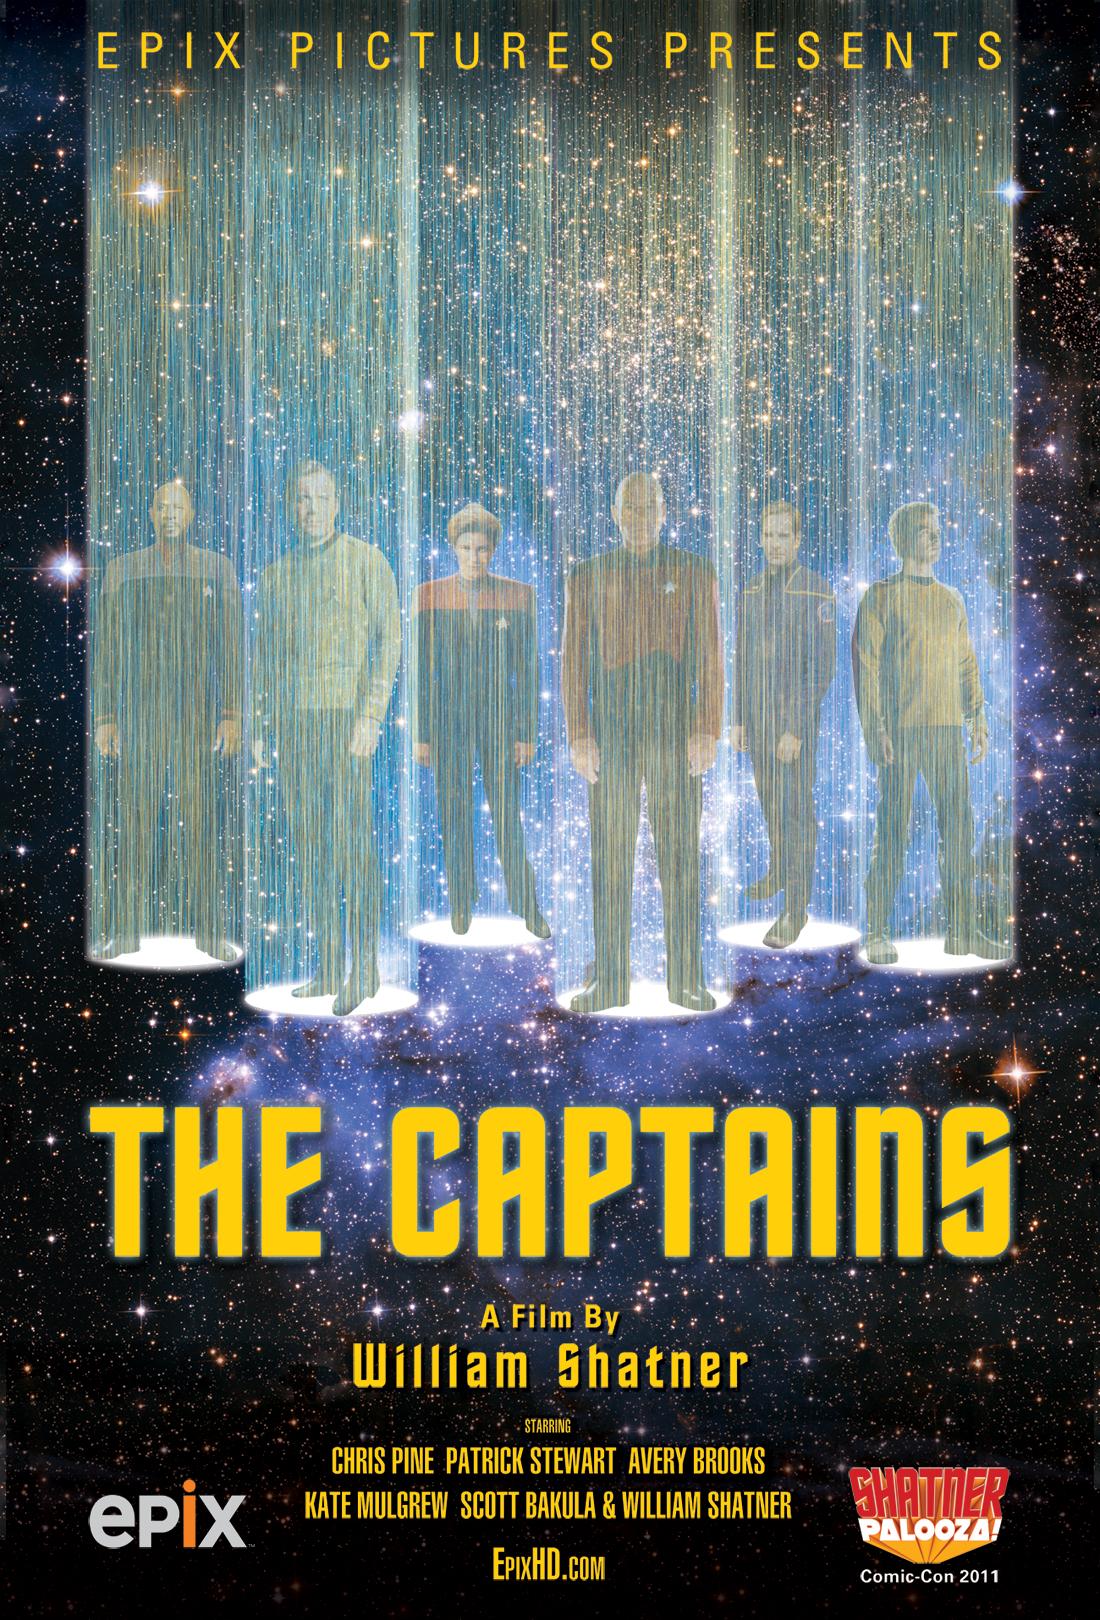 'Star Trek' Captains Join Forces in New William Shatner Documentary